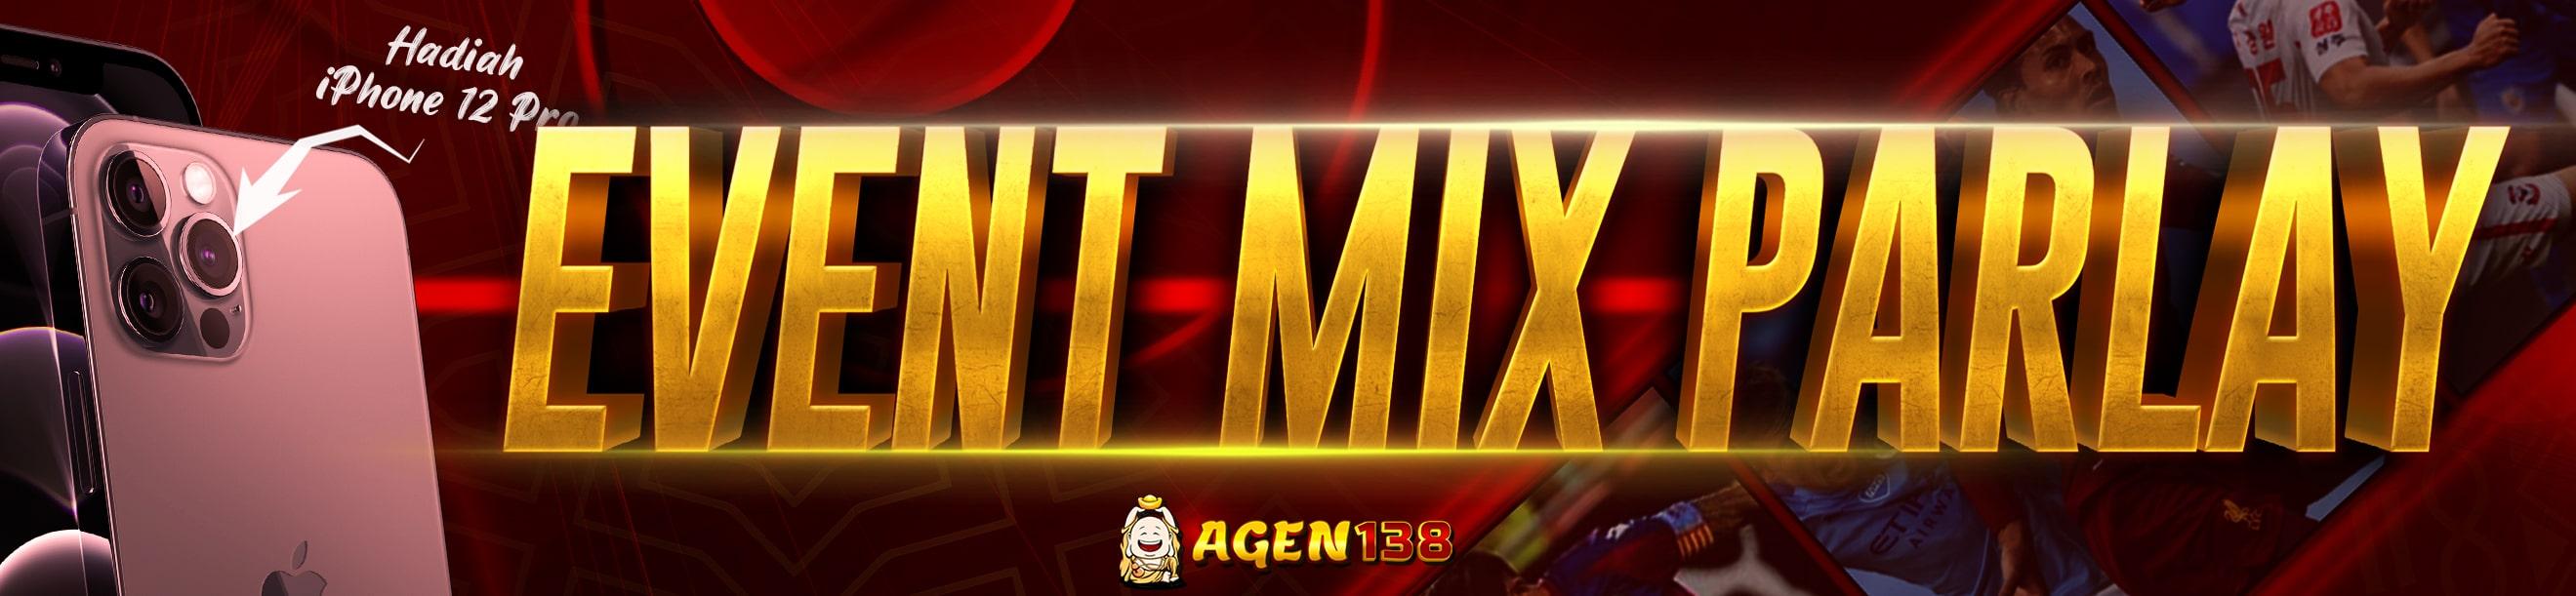 EVENT MIX PARLAY AGEN138